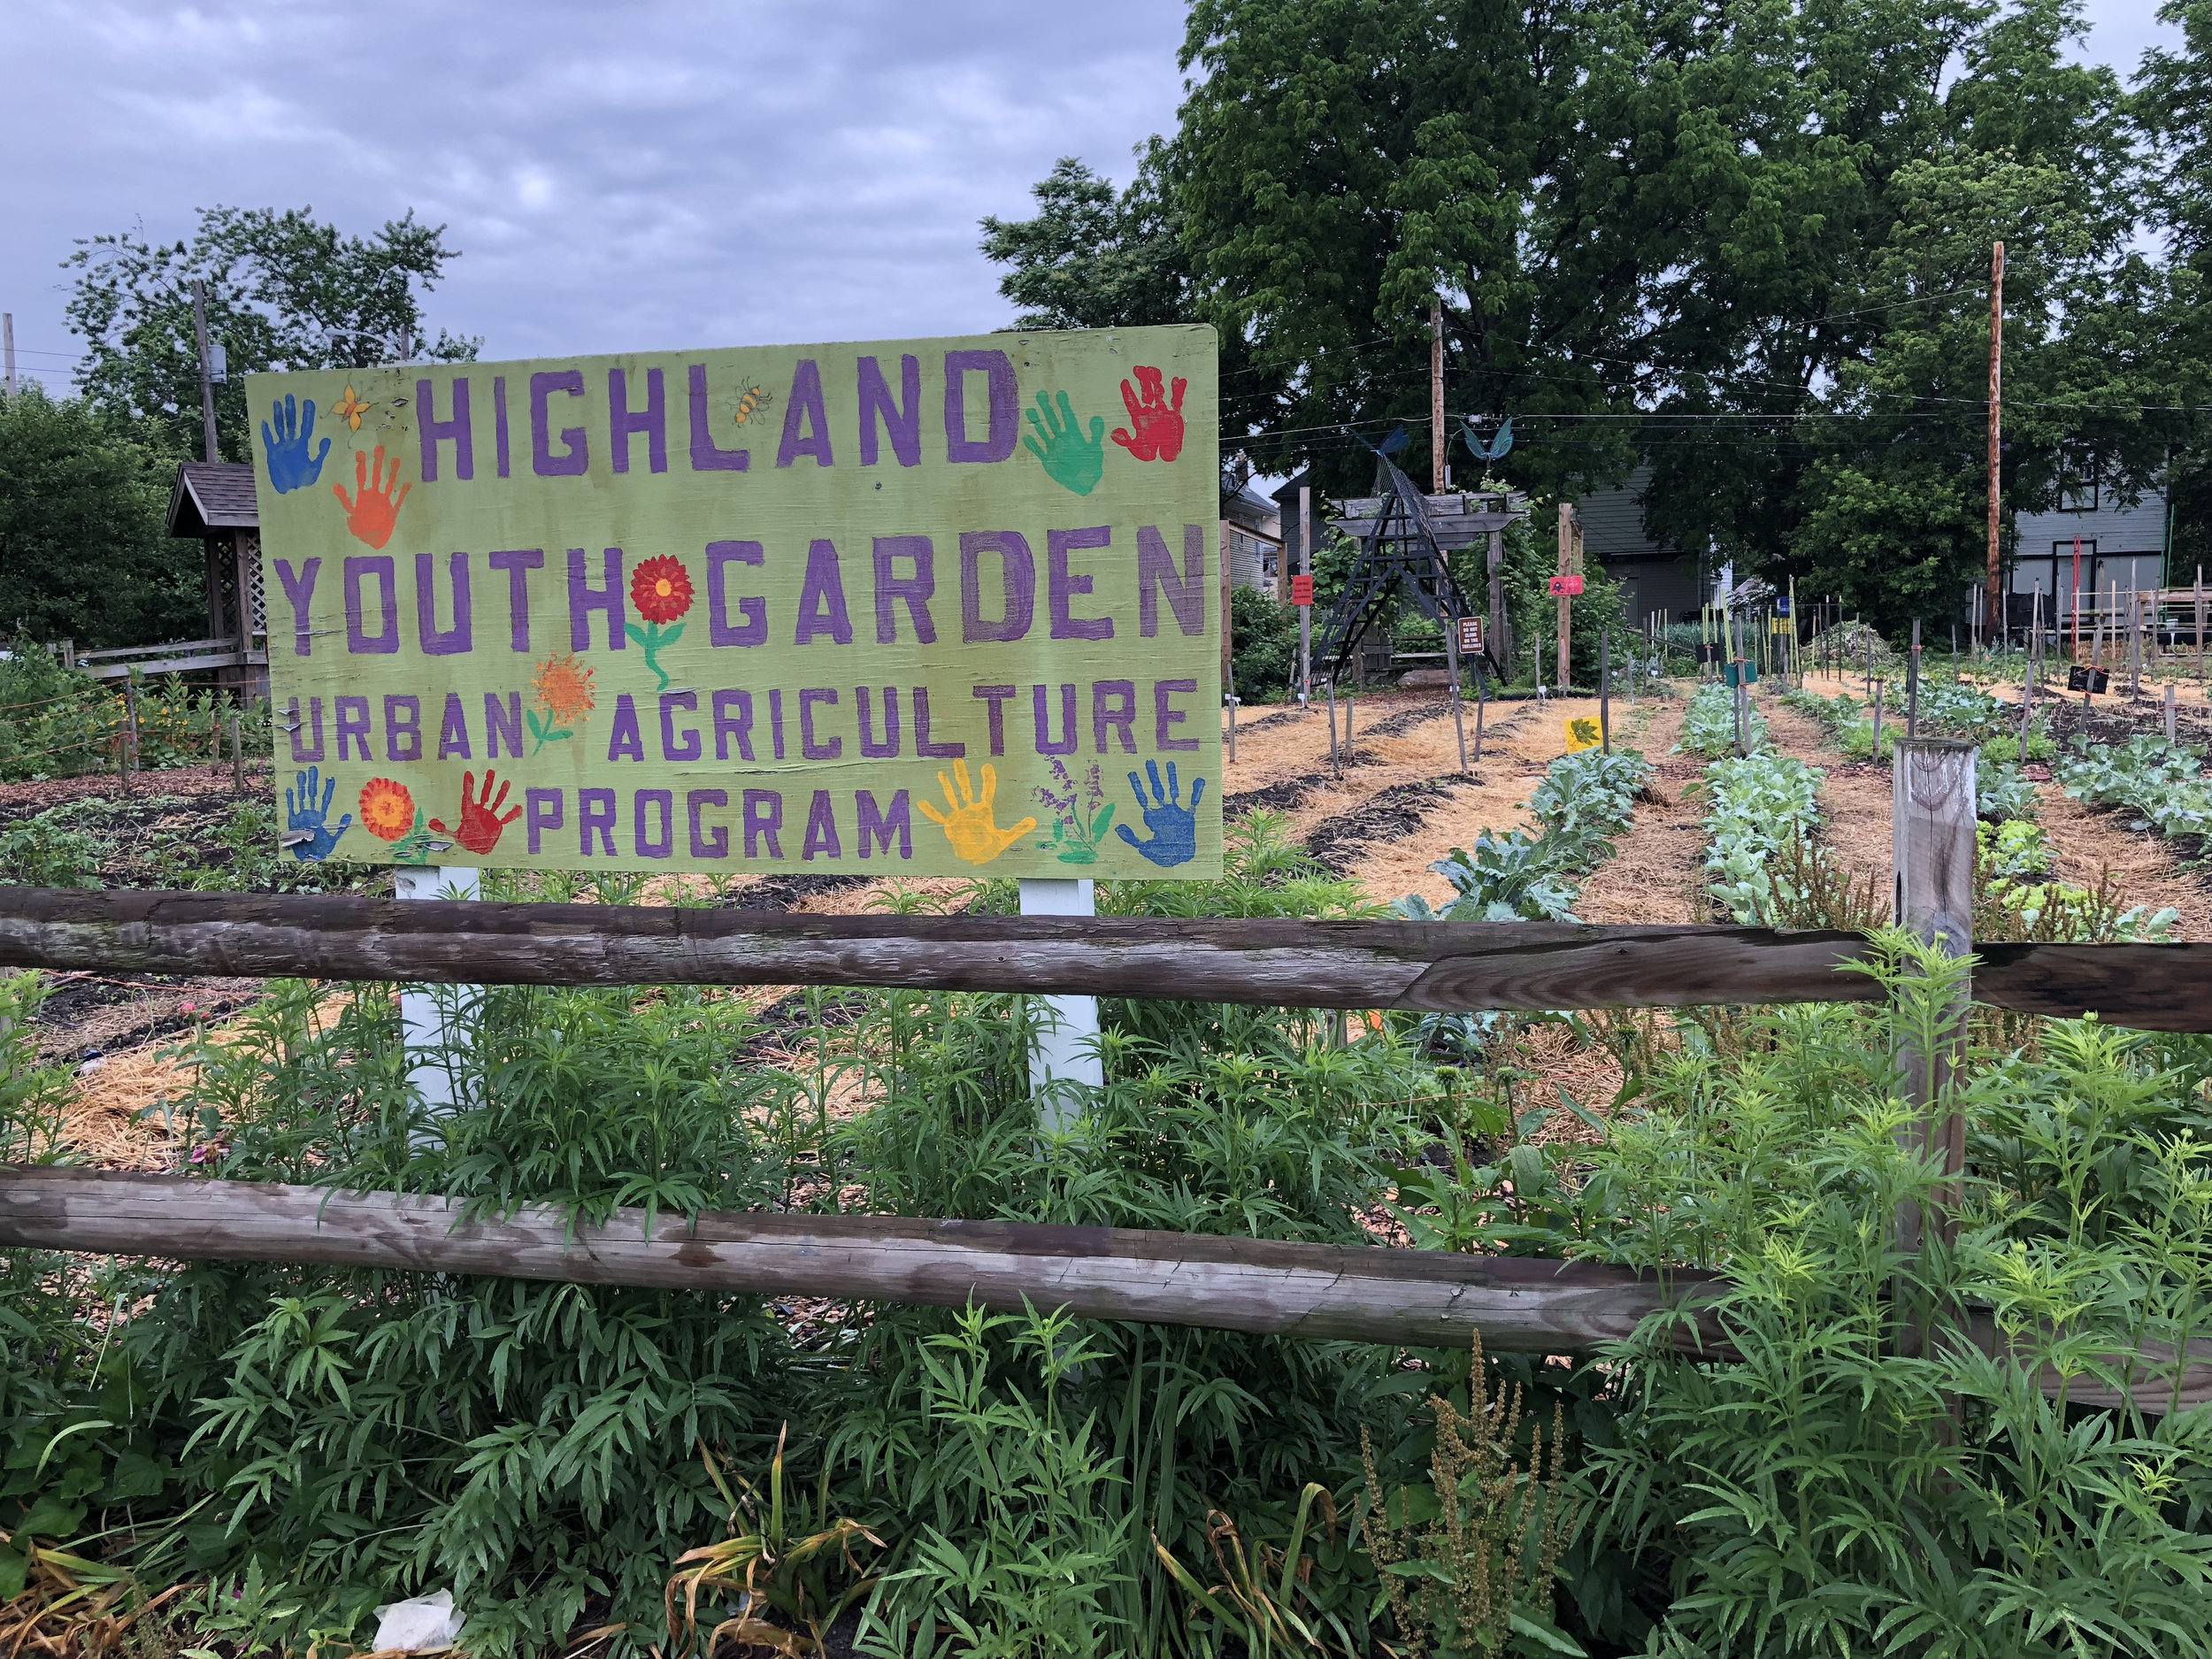 highland Youth Garden.jpg